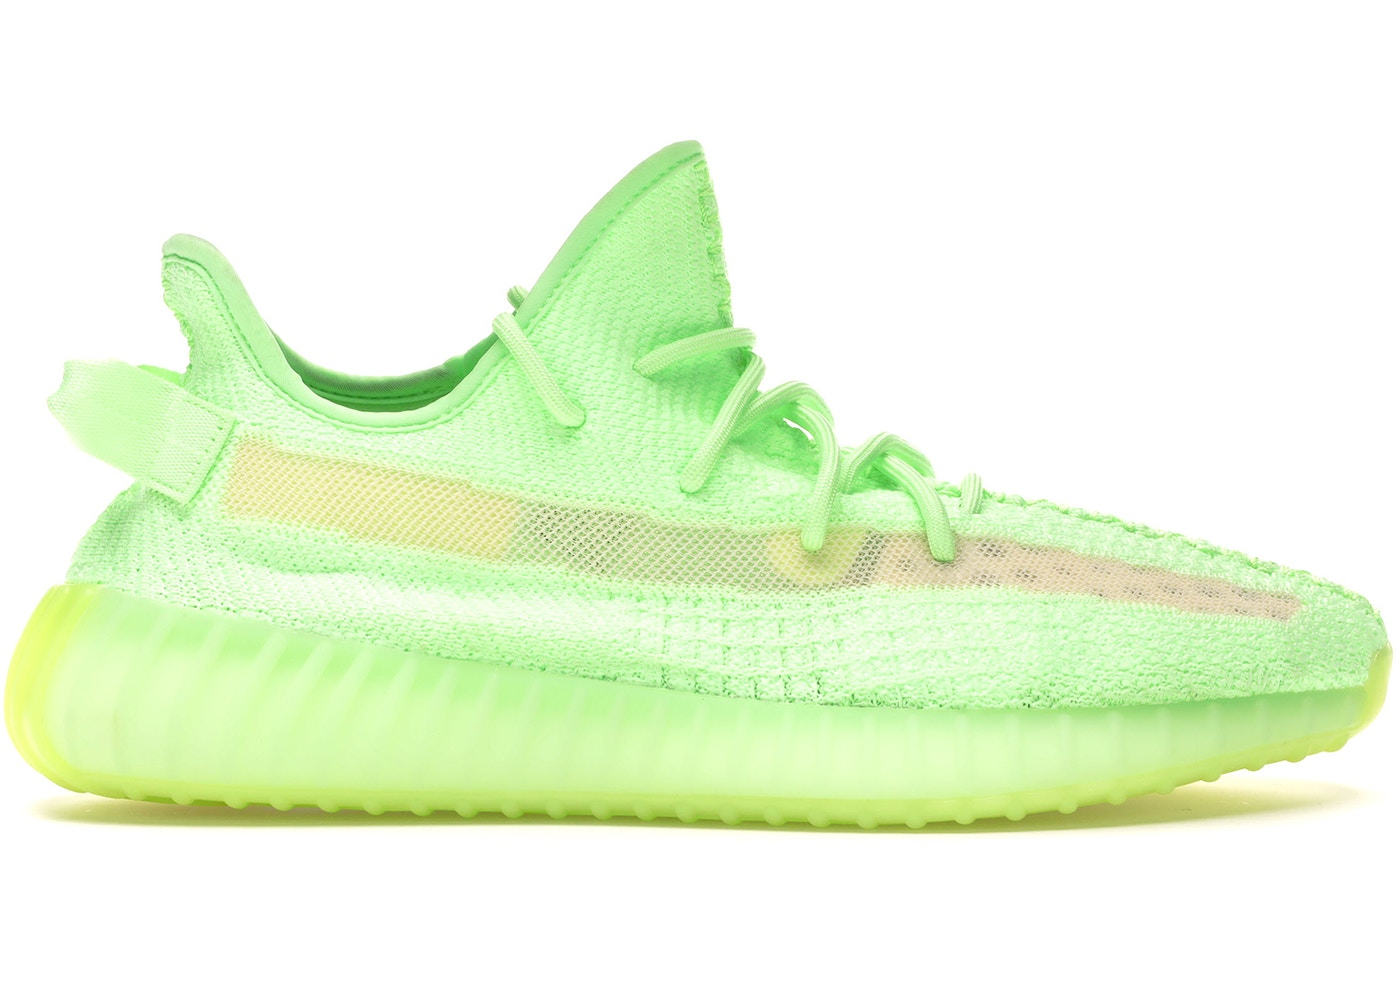 quality design c0348 0a574 adidas Yeezy Boost 350 V2 Glow